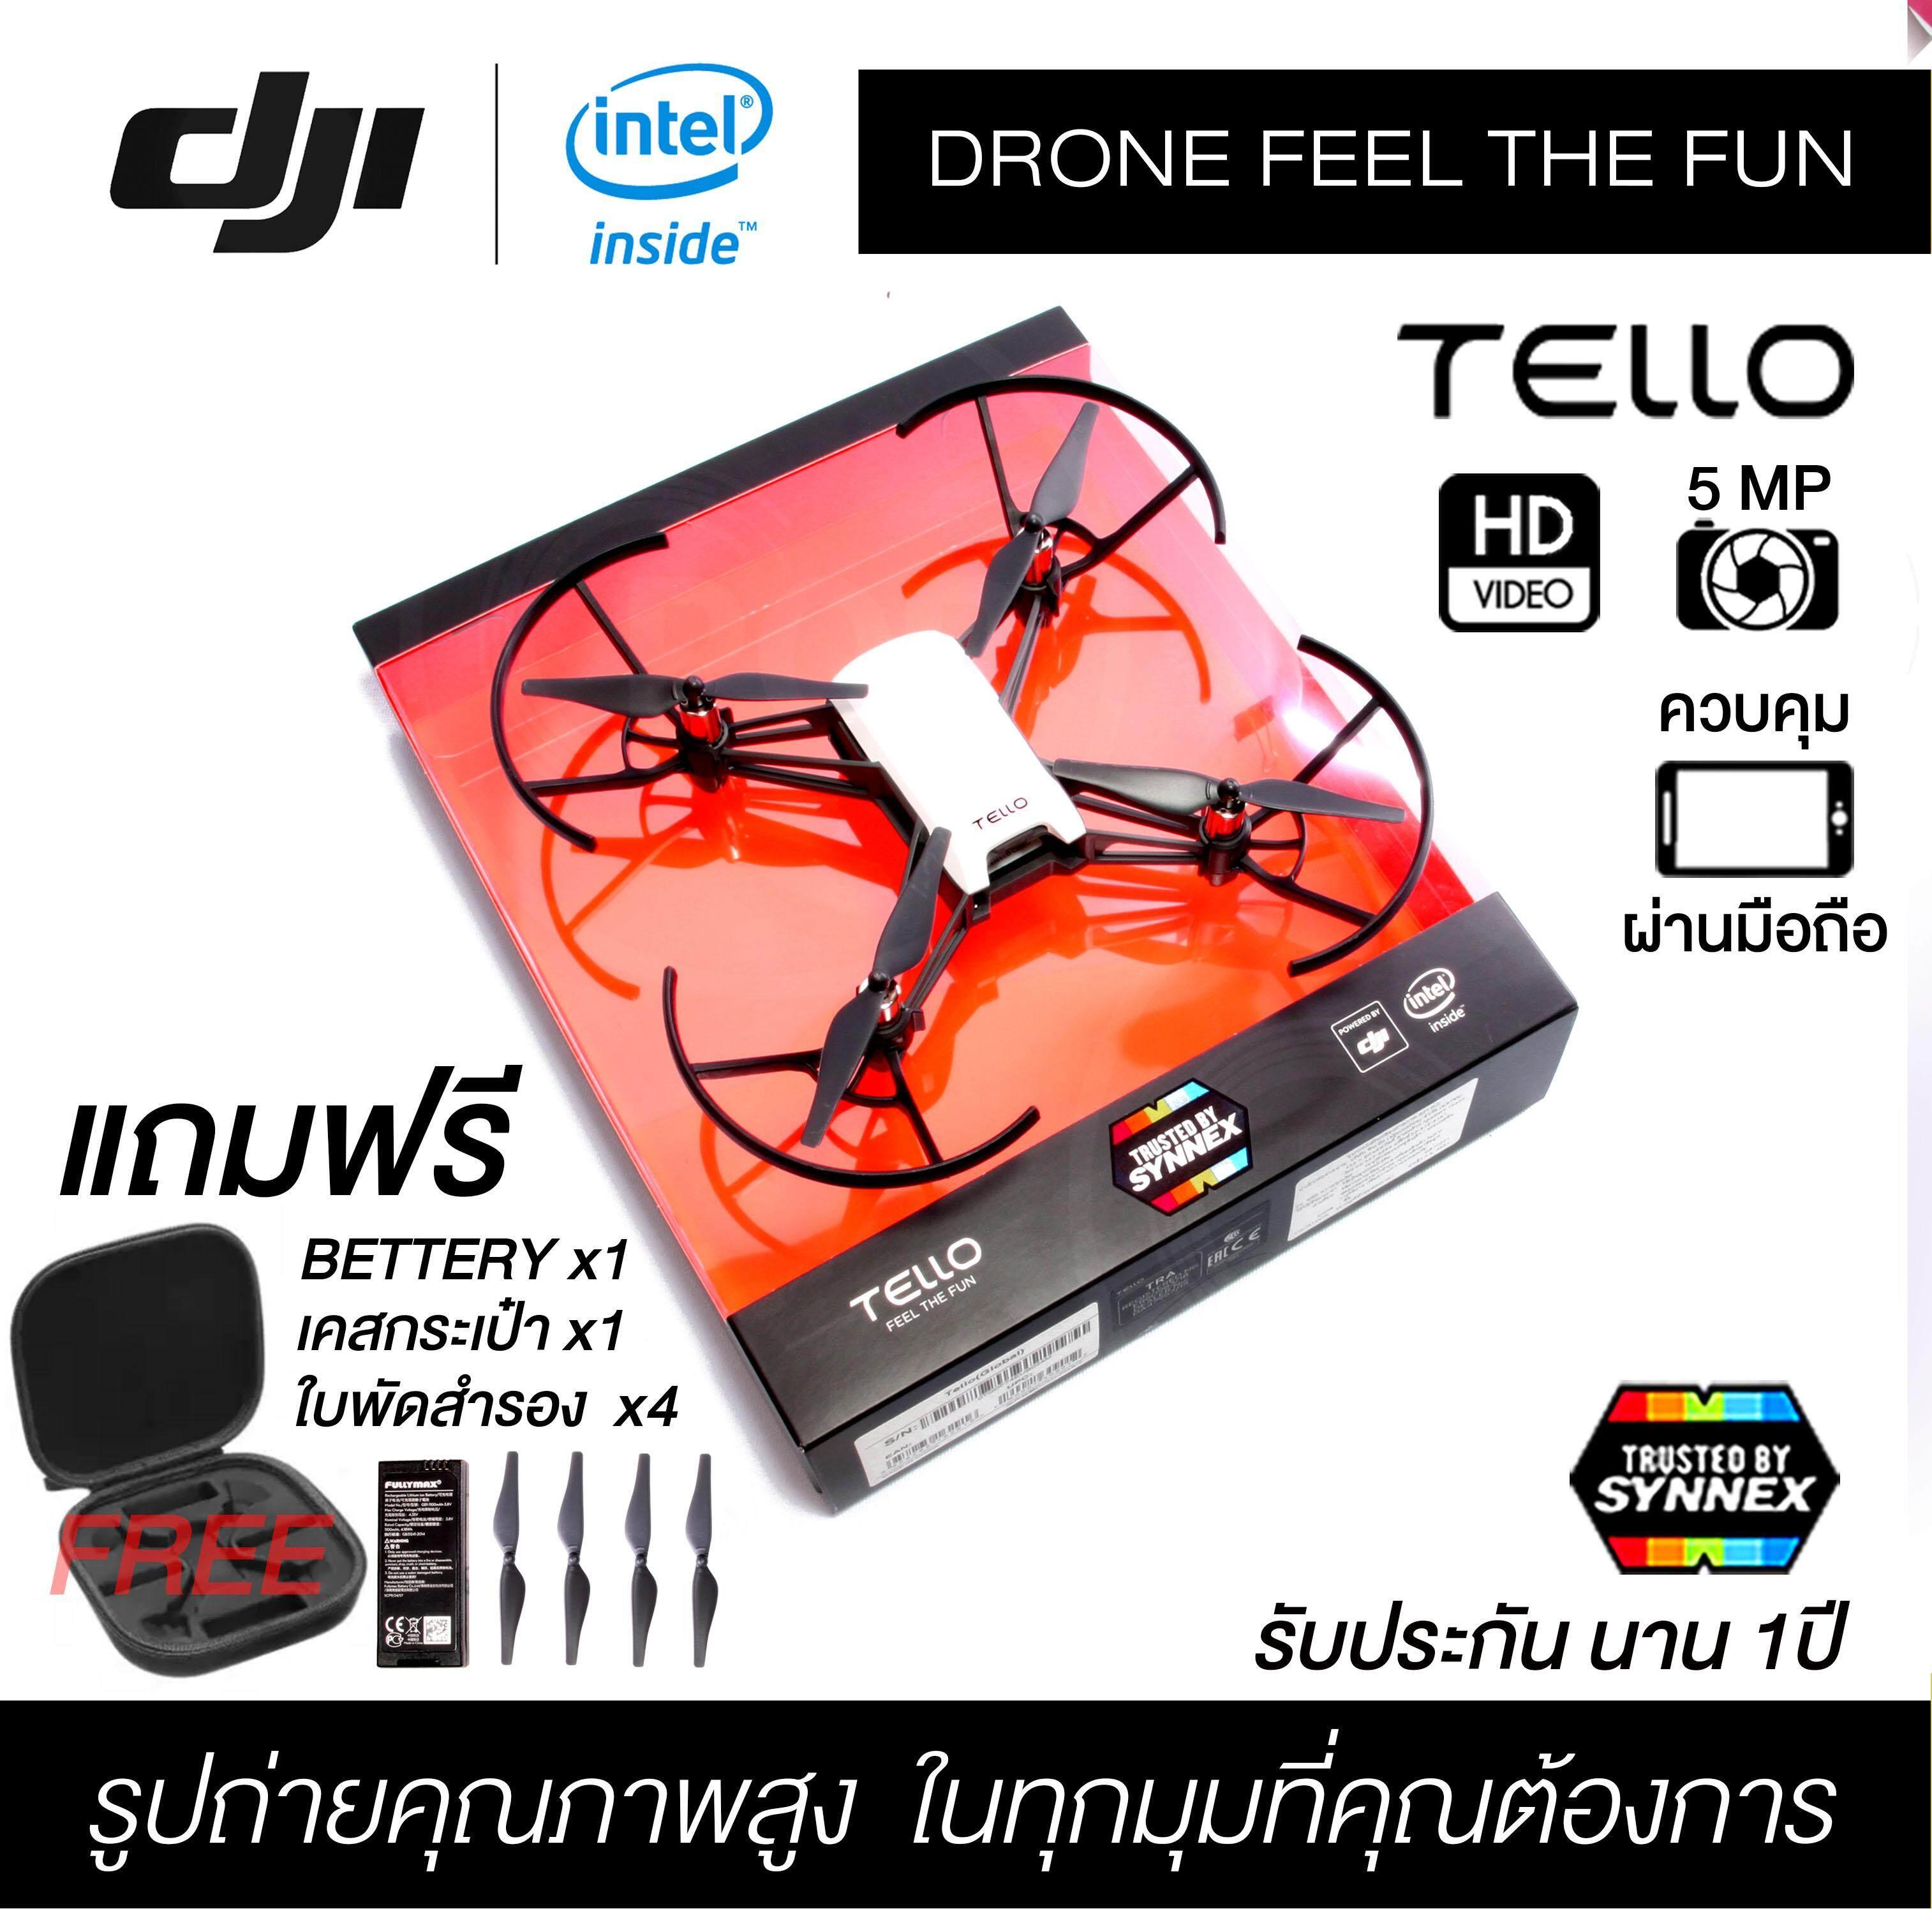 Dji Tello Camera Drone โดรนจิ๋วสุดคุ้ม กล้อง 5ล้านพิกเซล พร้อมโหมดบินอัตโนมัติ By Lifetechshop.